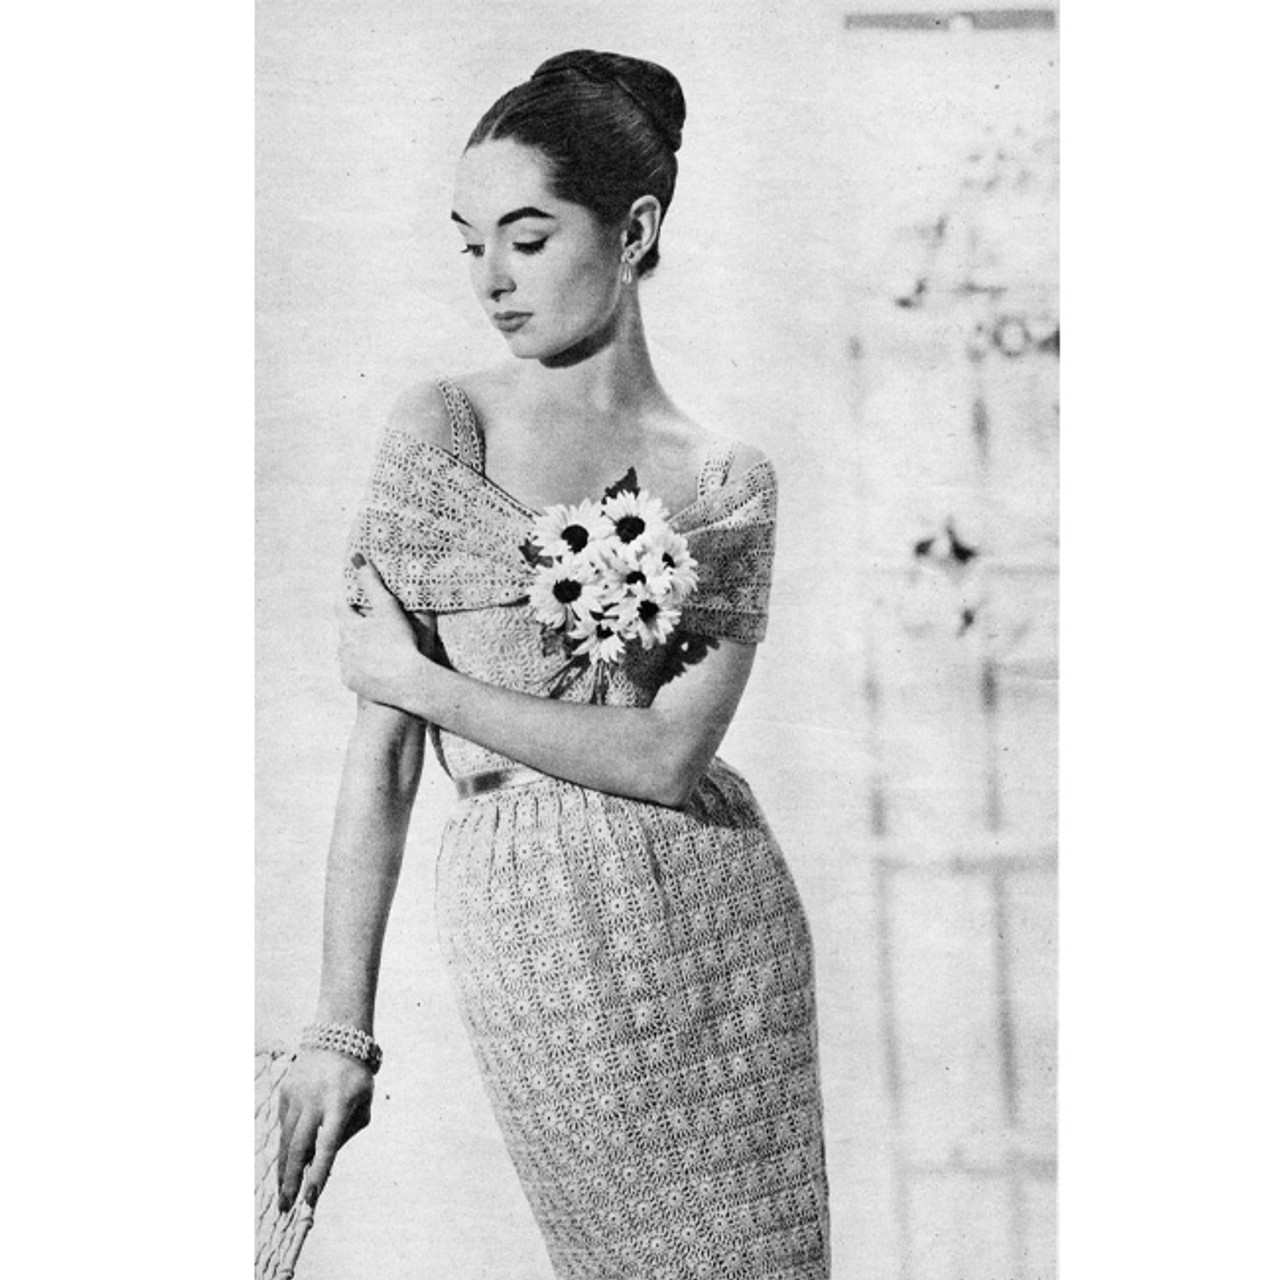 Crochet Strap Dress Pattern with Stole